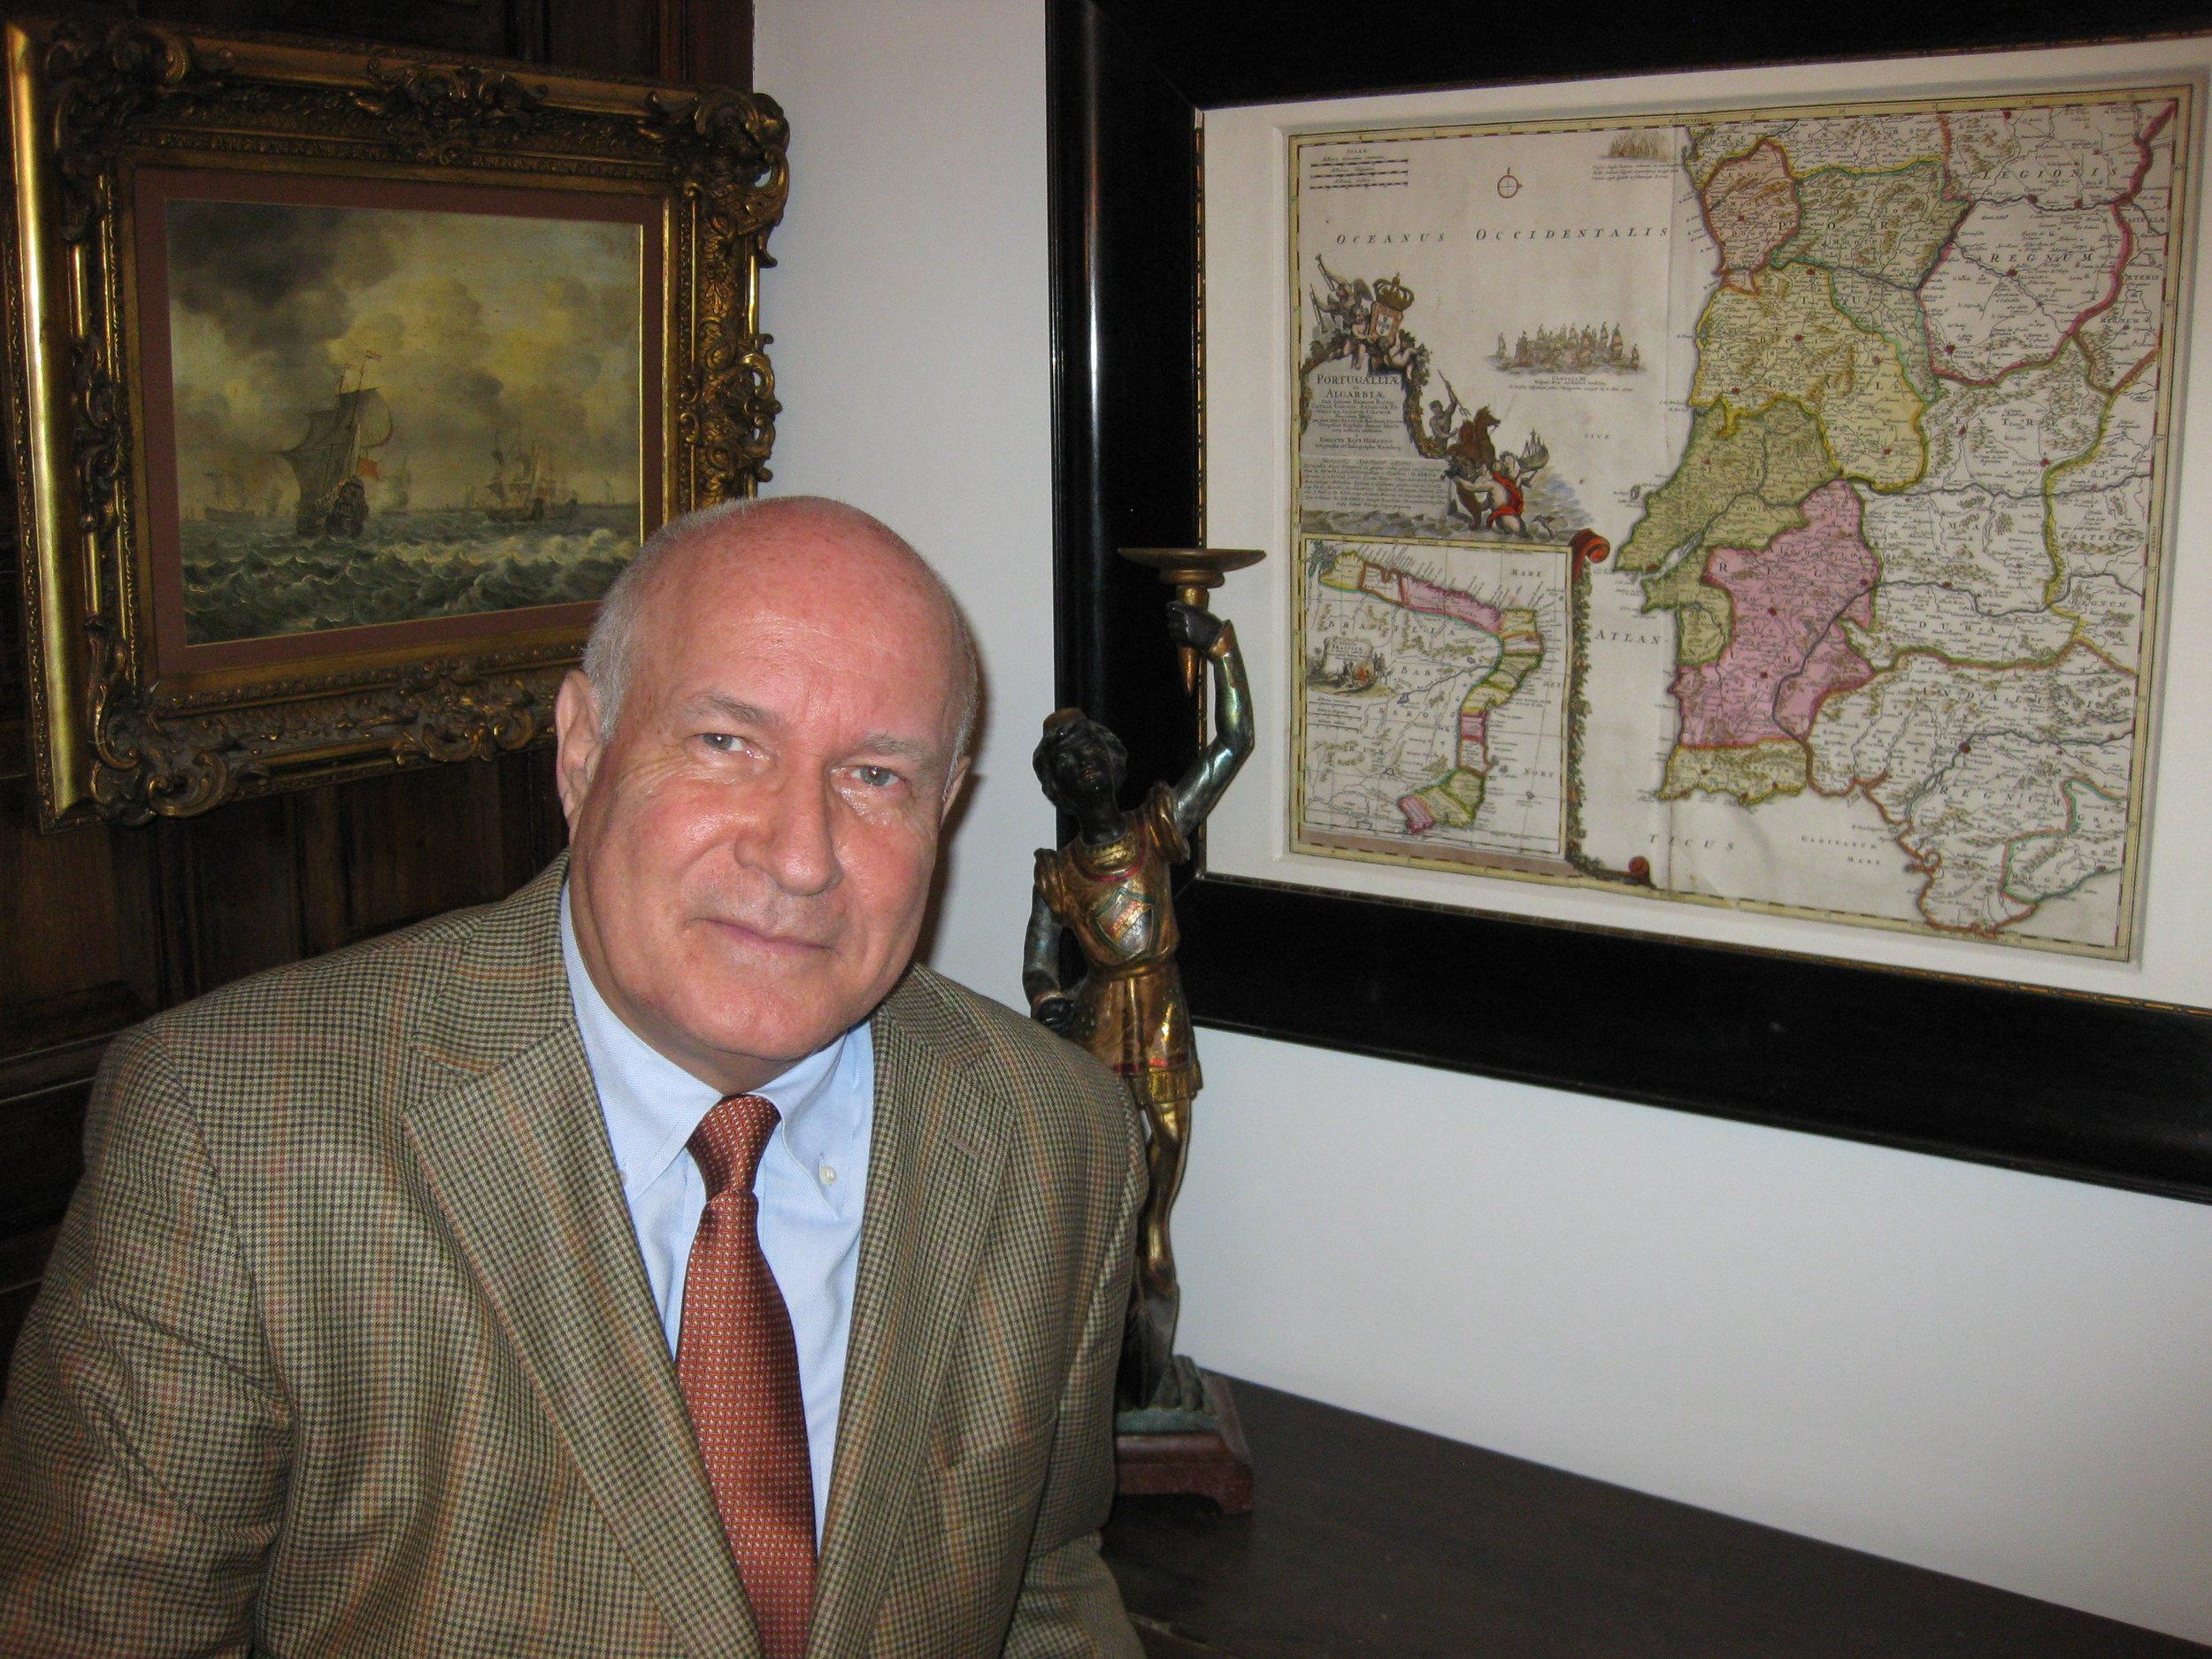 Dominique Edouard Baechler Acervo pessoal